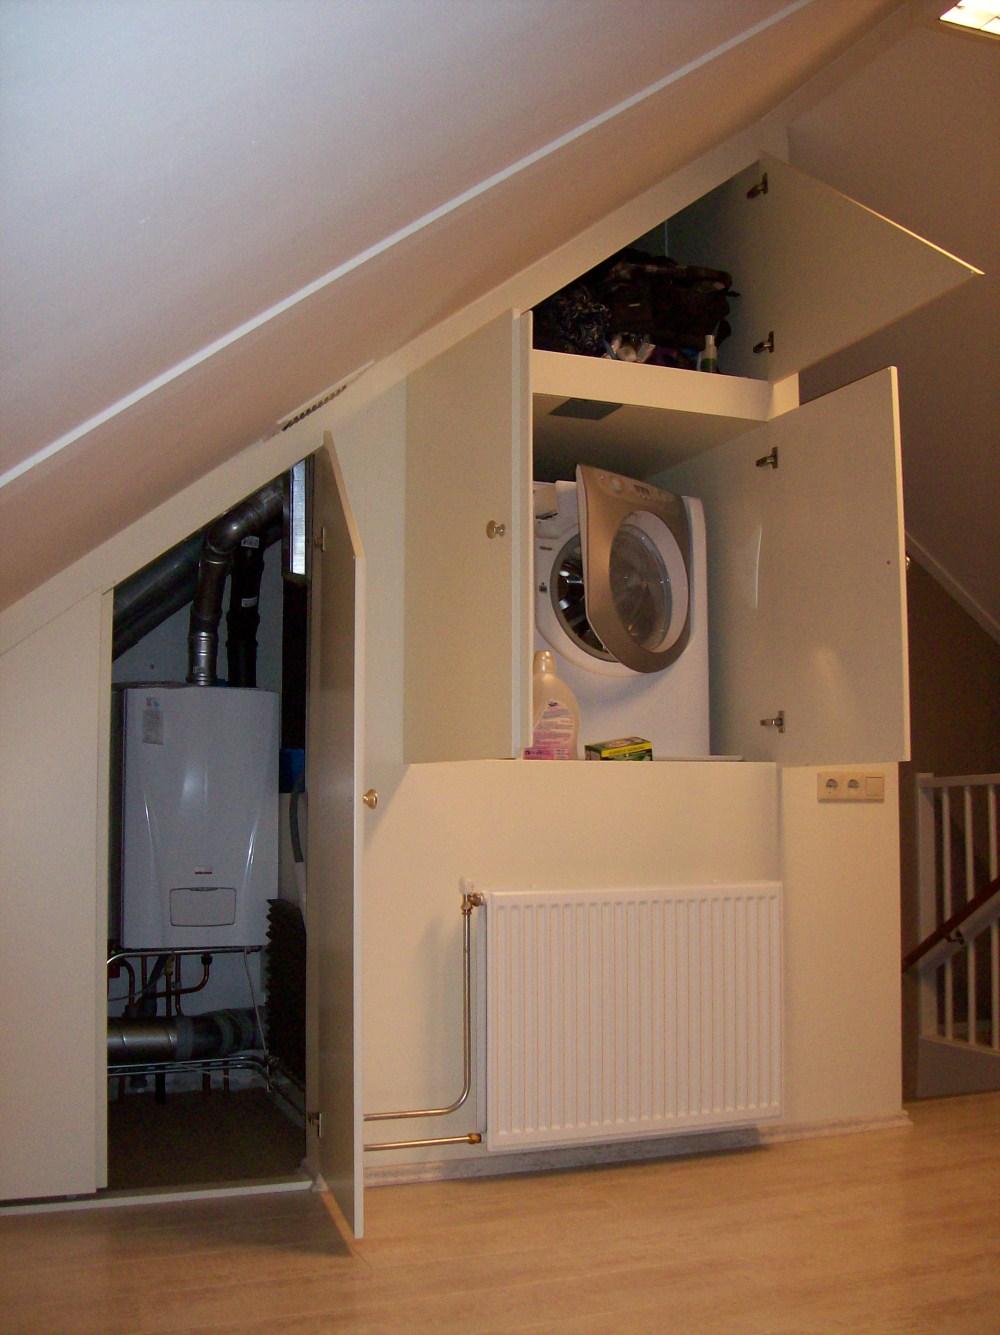 Badkamer wasmachine oplossing: oplossing gevraagd voor plaatsen ...